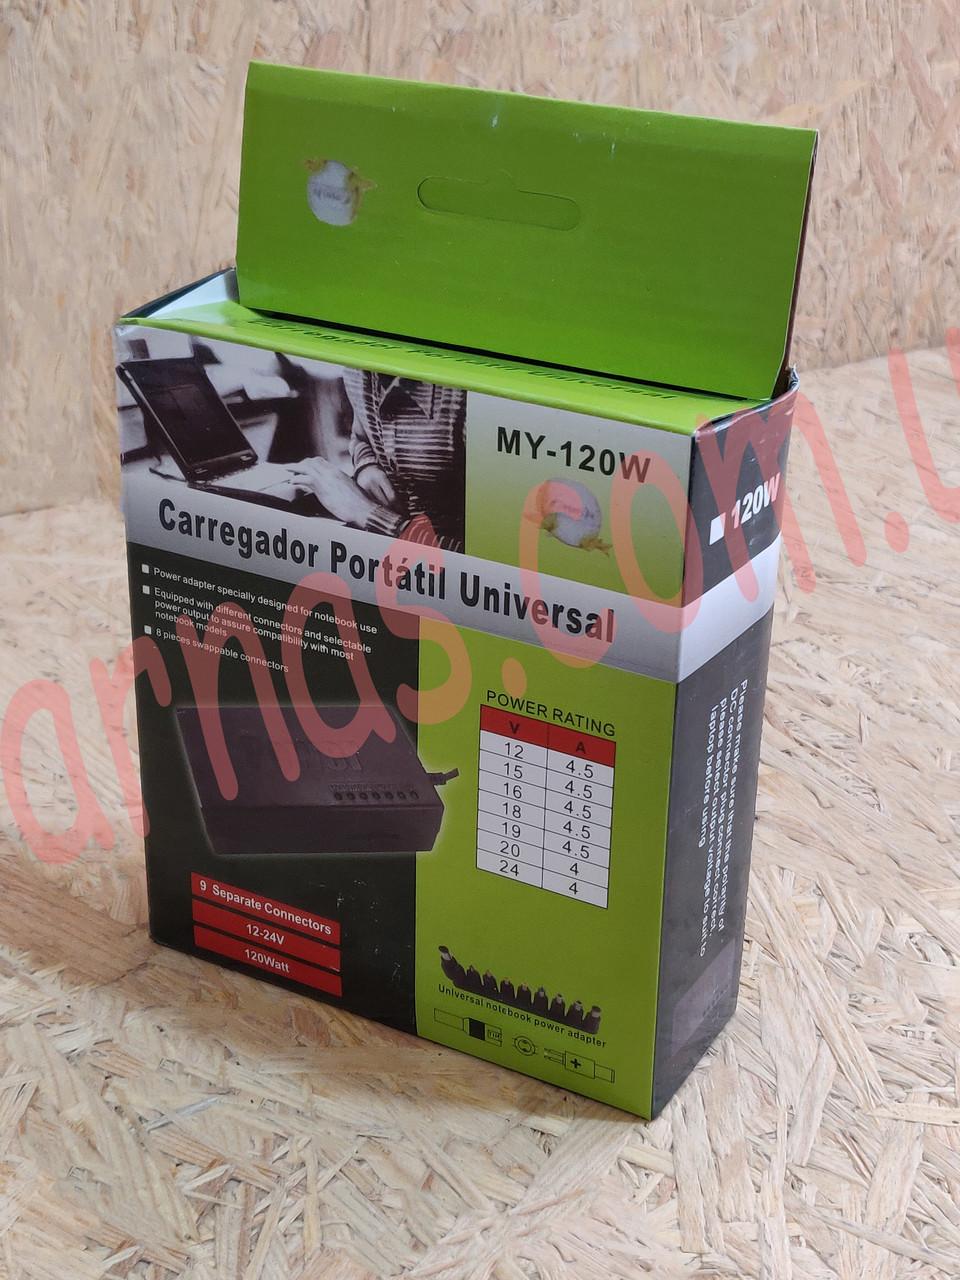 Адаптер MY-120W универсальное зарядное устройство для ноутбуков, фото 1